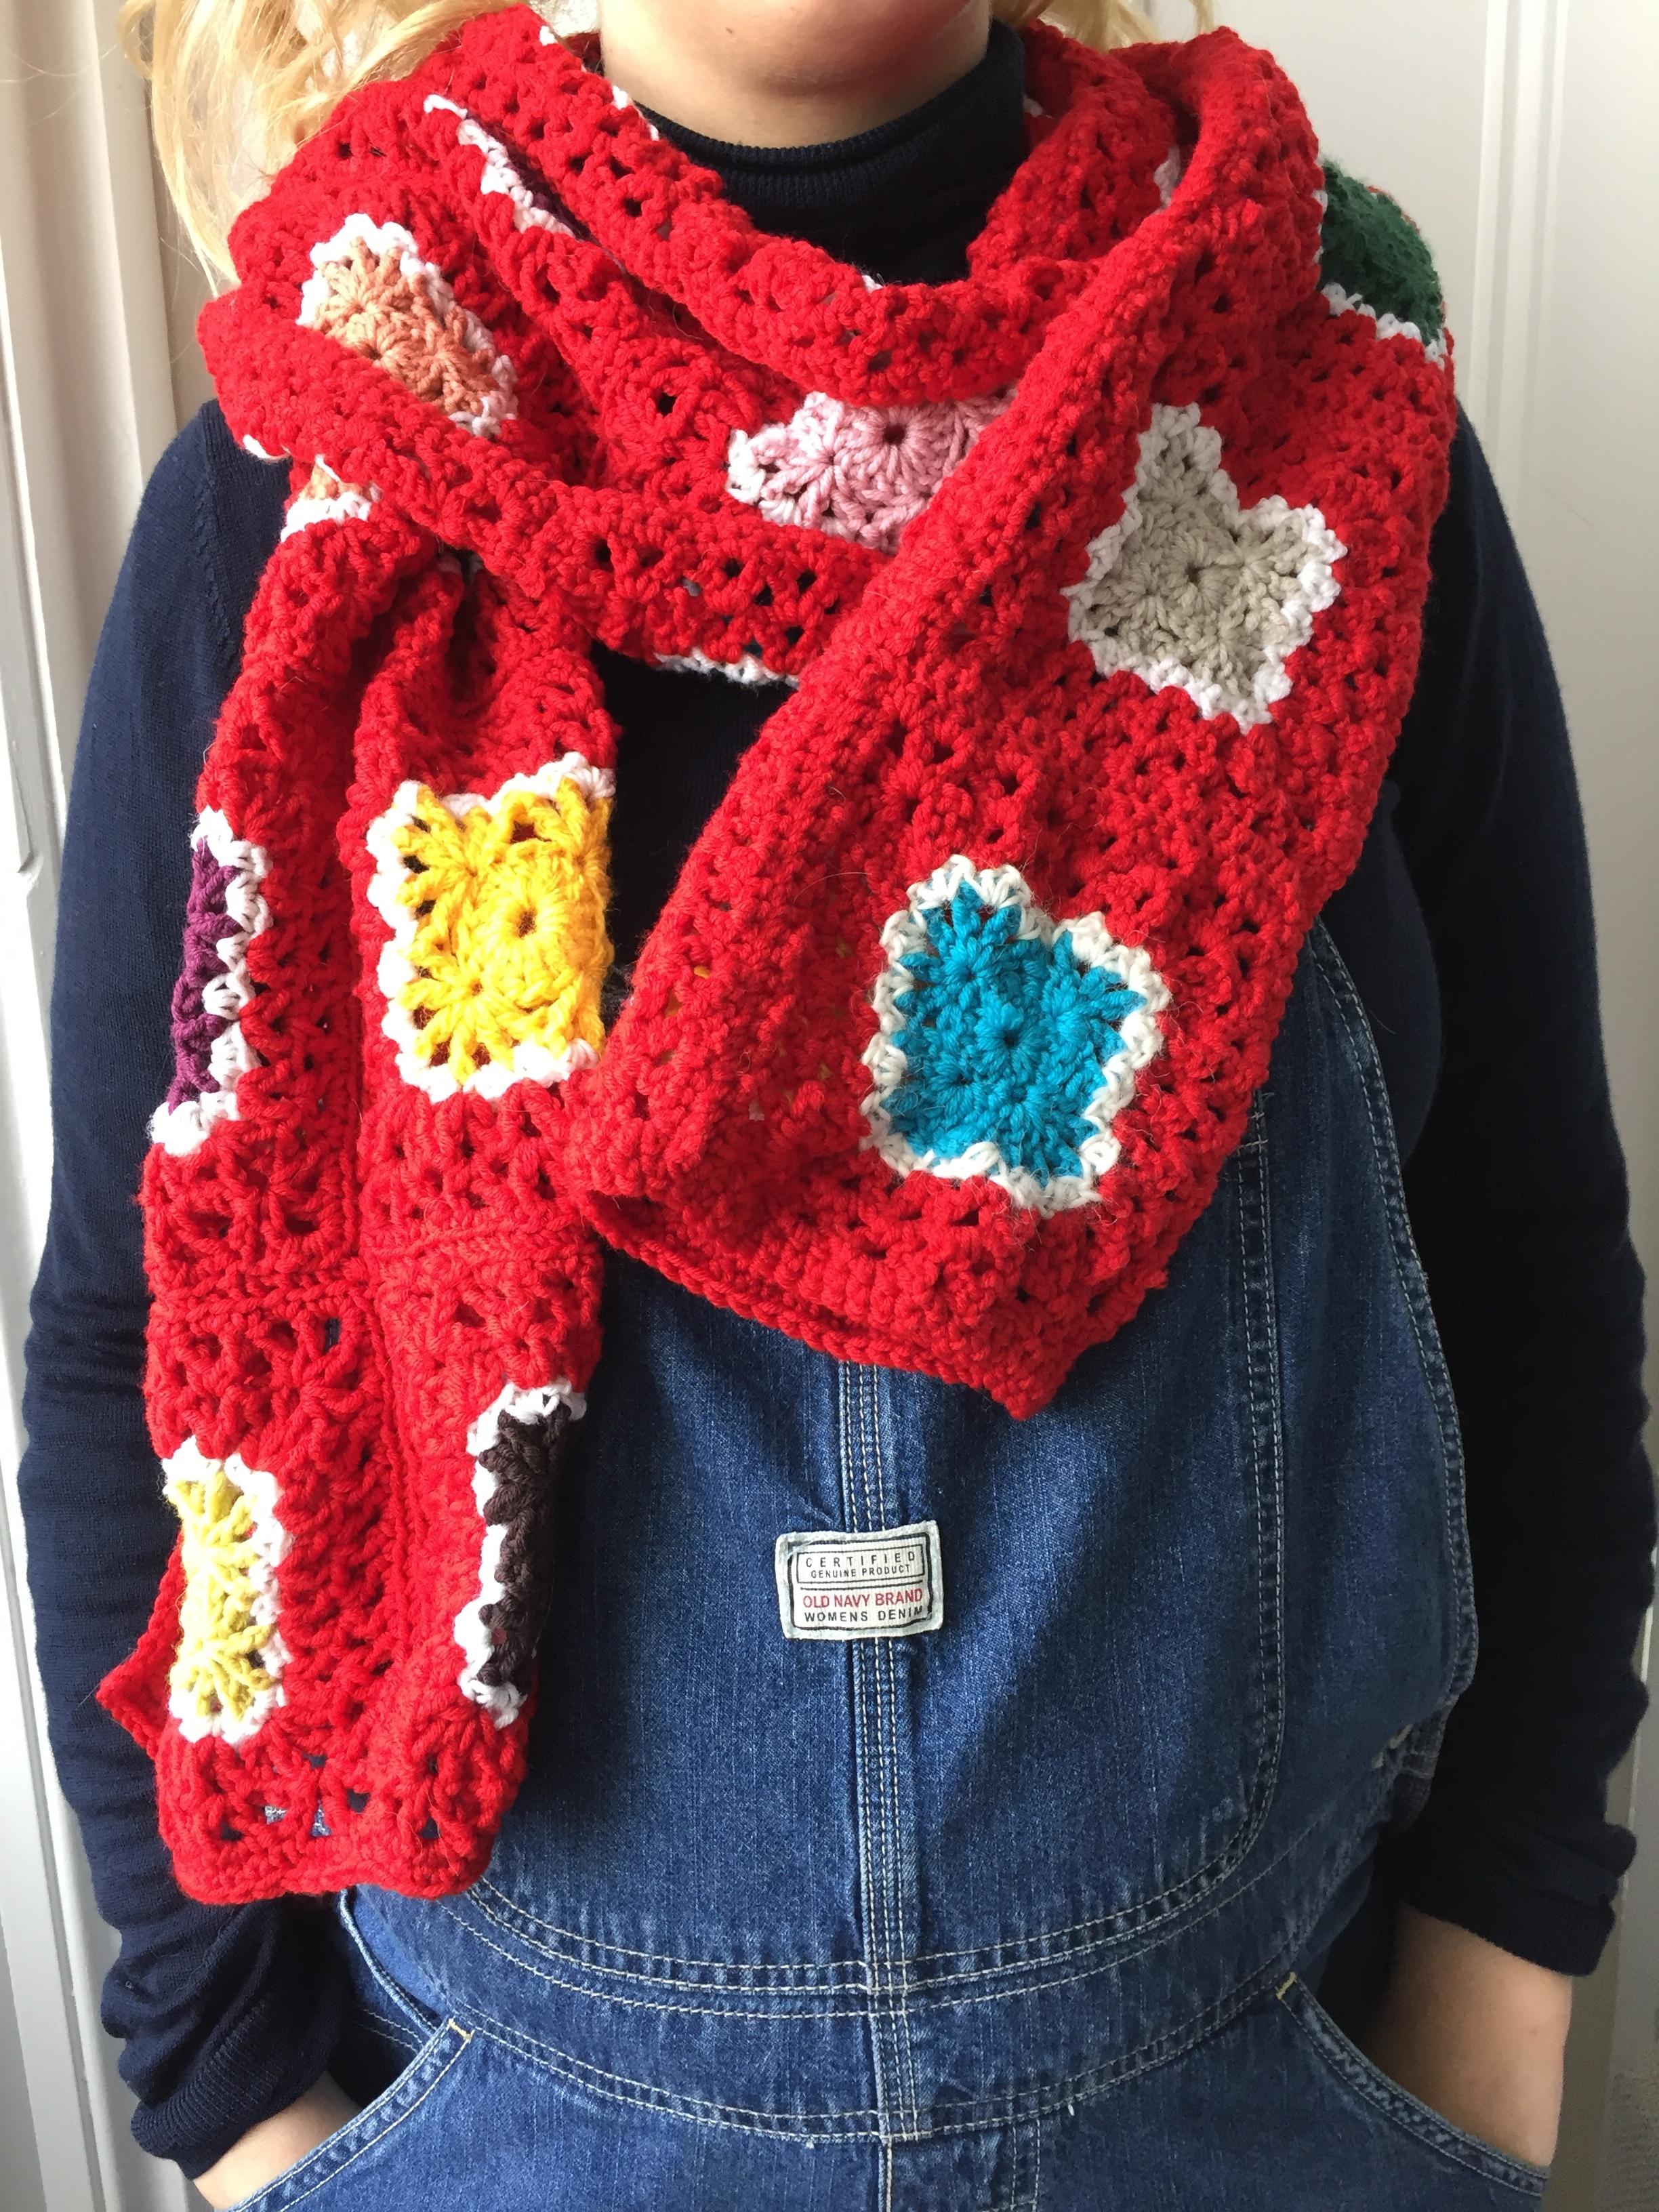 Paloma Scarf - February Crochet Club